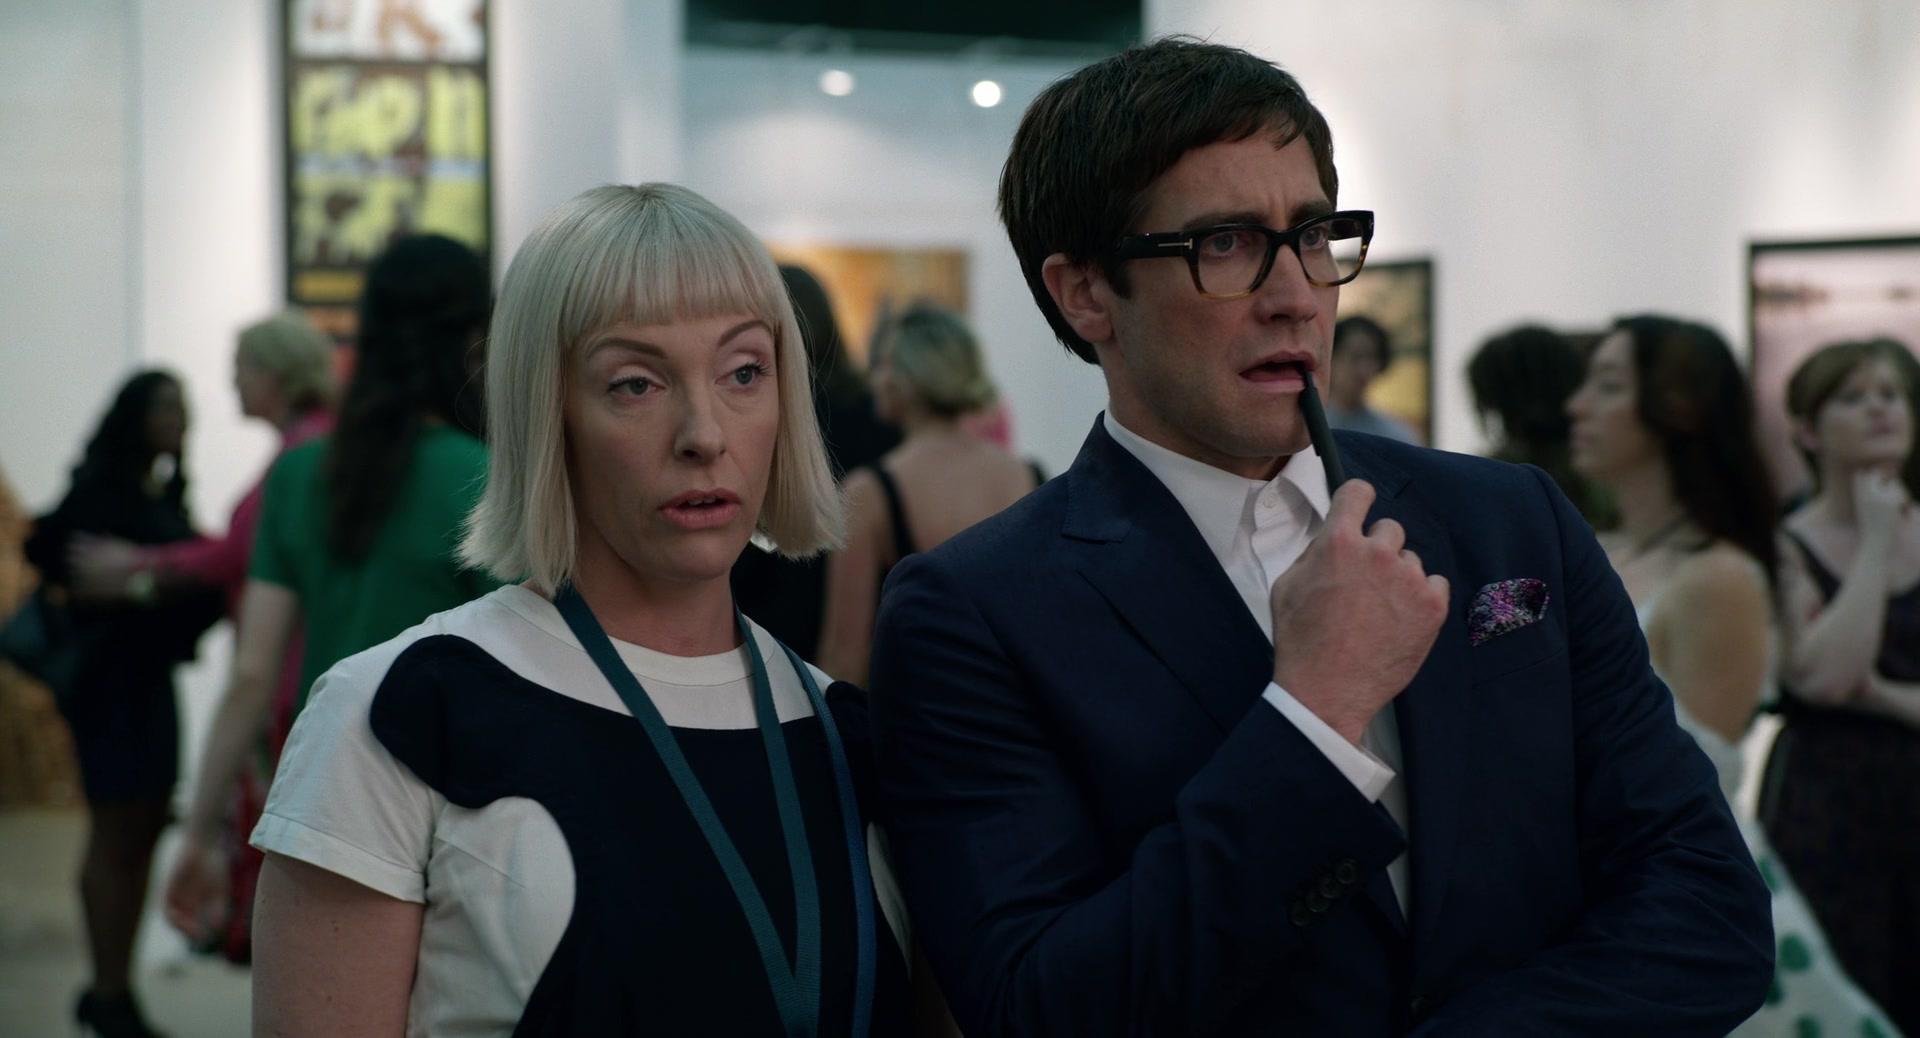 7cda75e9b9cc9 Tom Ford Geometric Glasses Worn by Jake Gyllenhaal in Velvet Buzzsaw (2019)  Movie Product